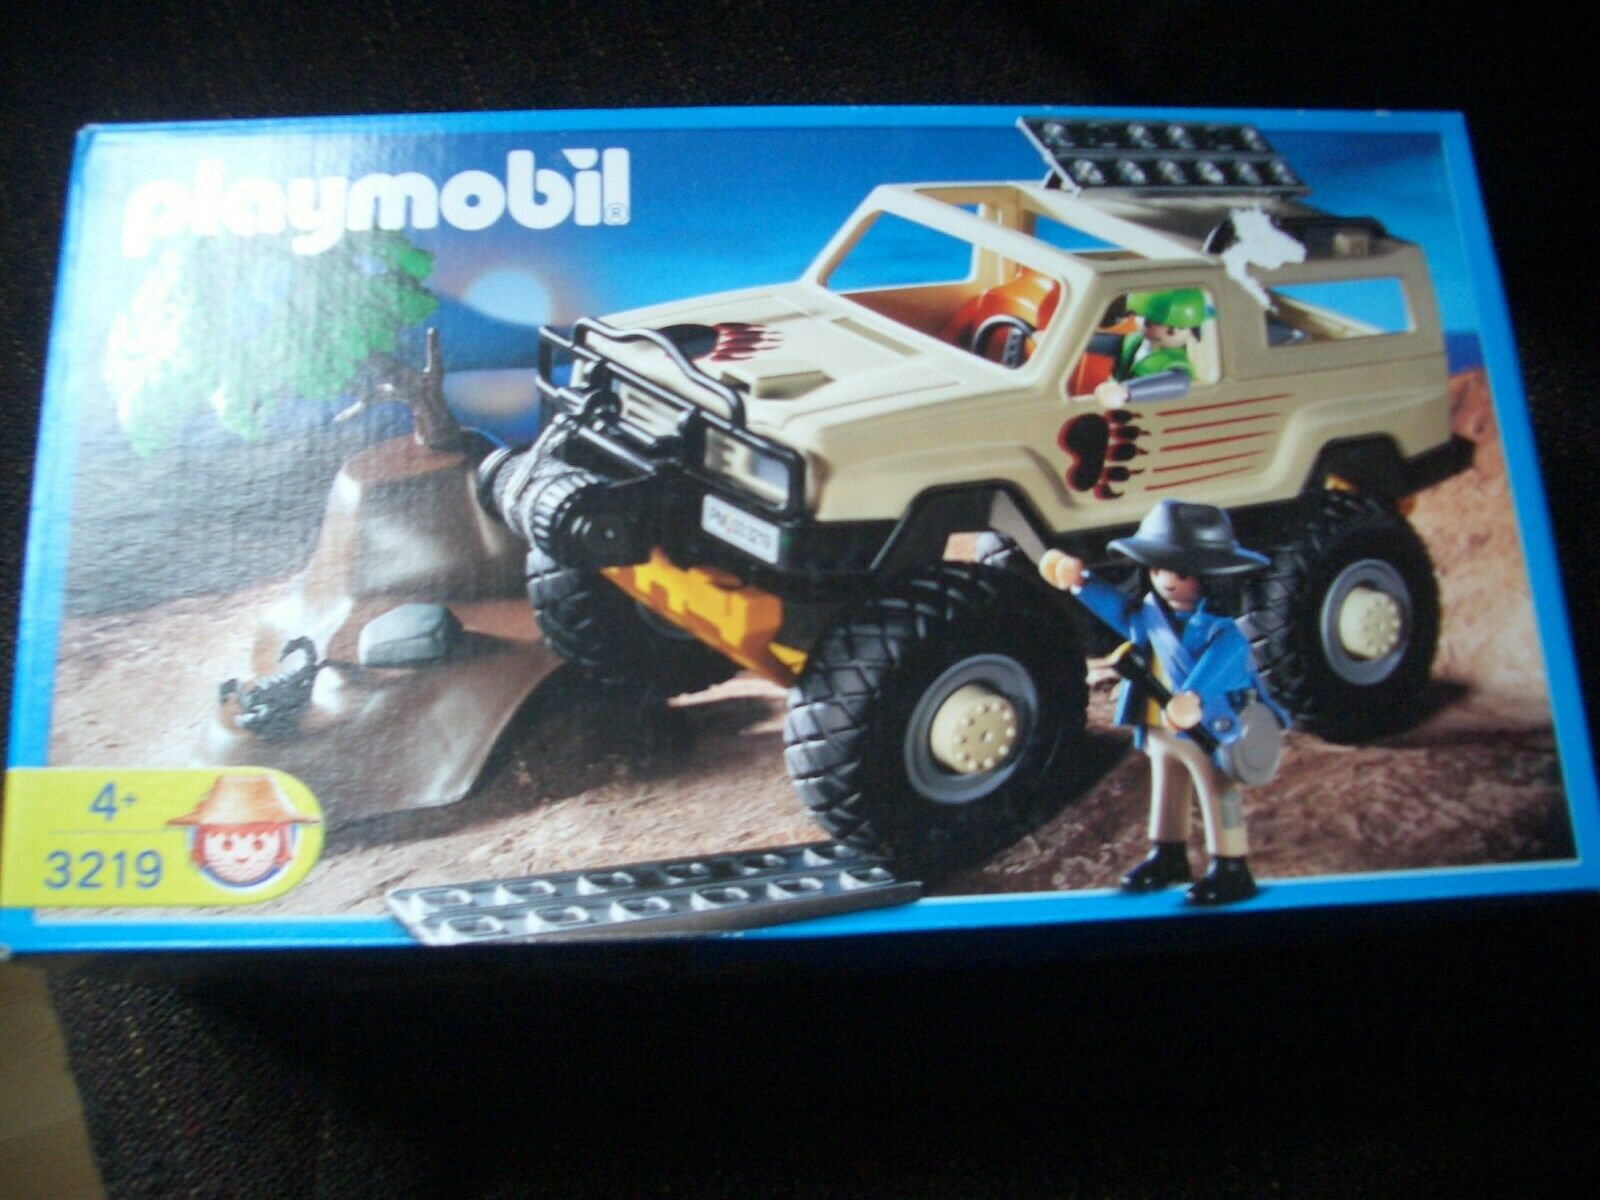 Playmobil 4x4 safari car adventure explorers ref 3219 new in box